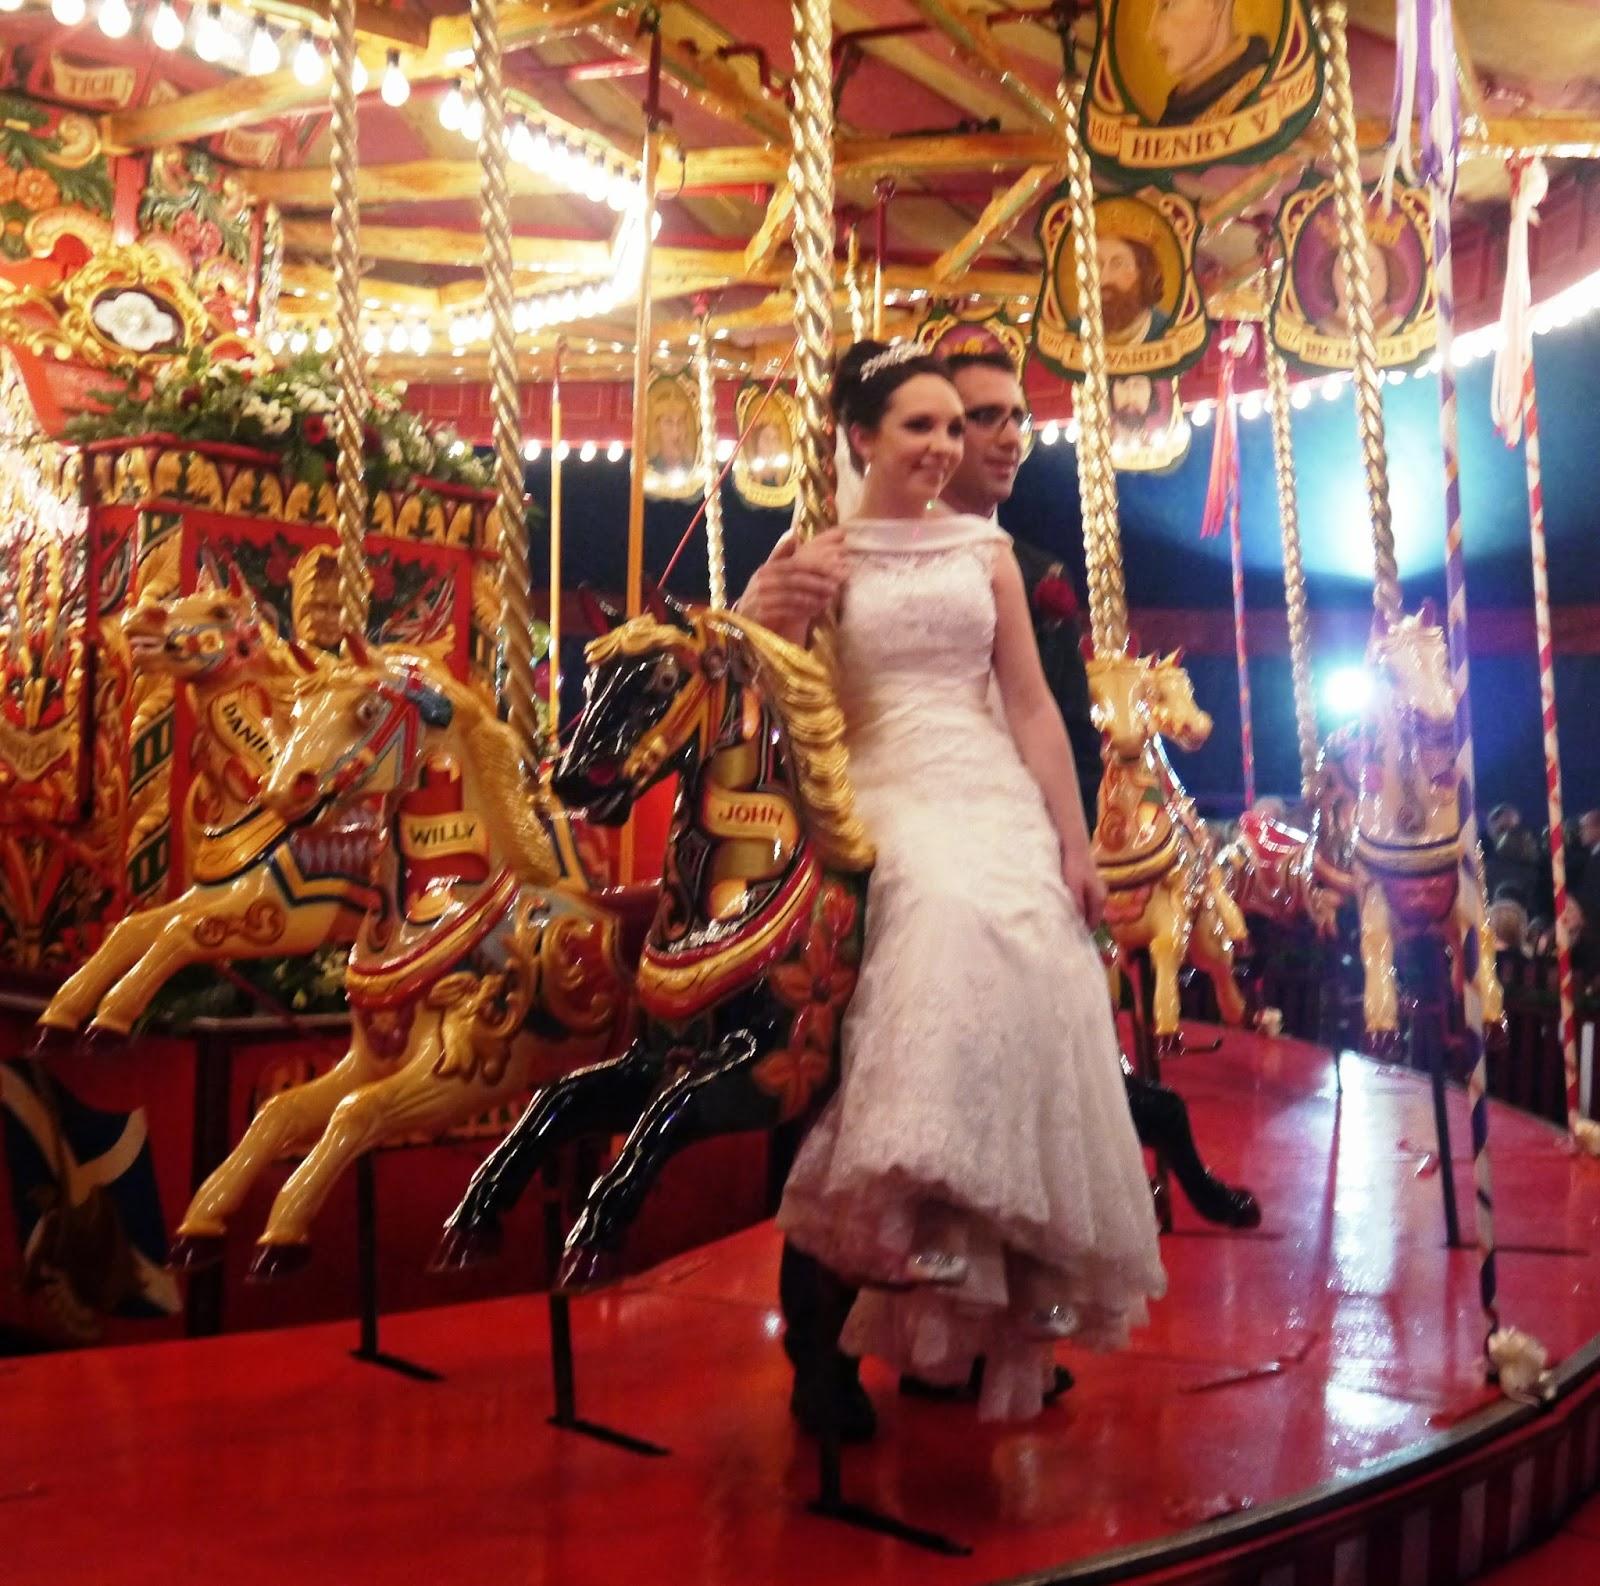 Carters Steam Fair Wedding - Bride and Groom